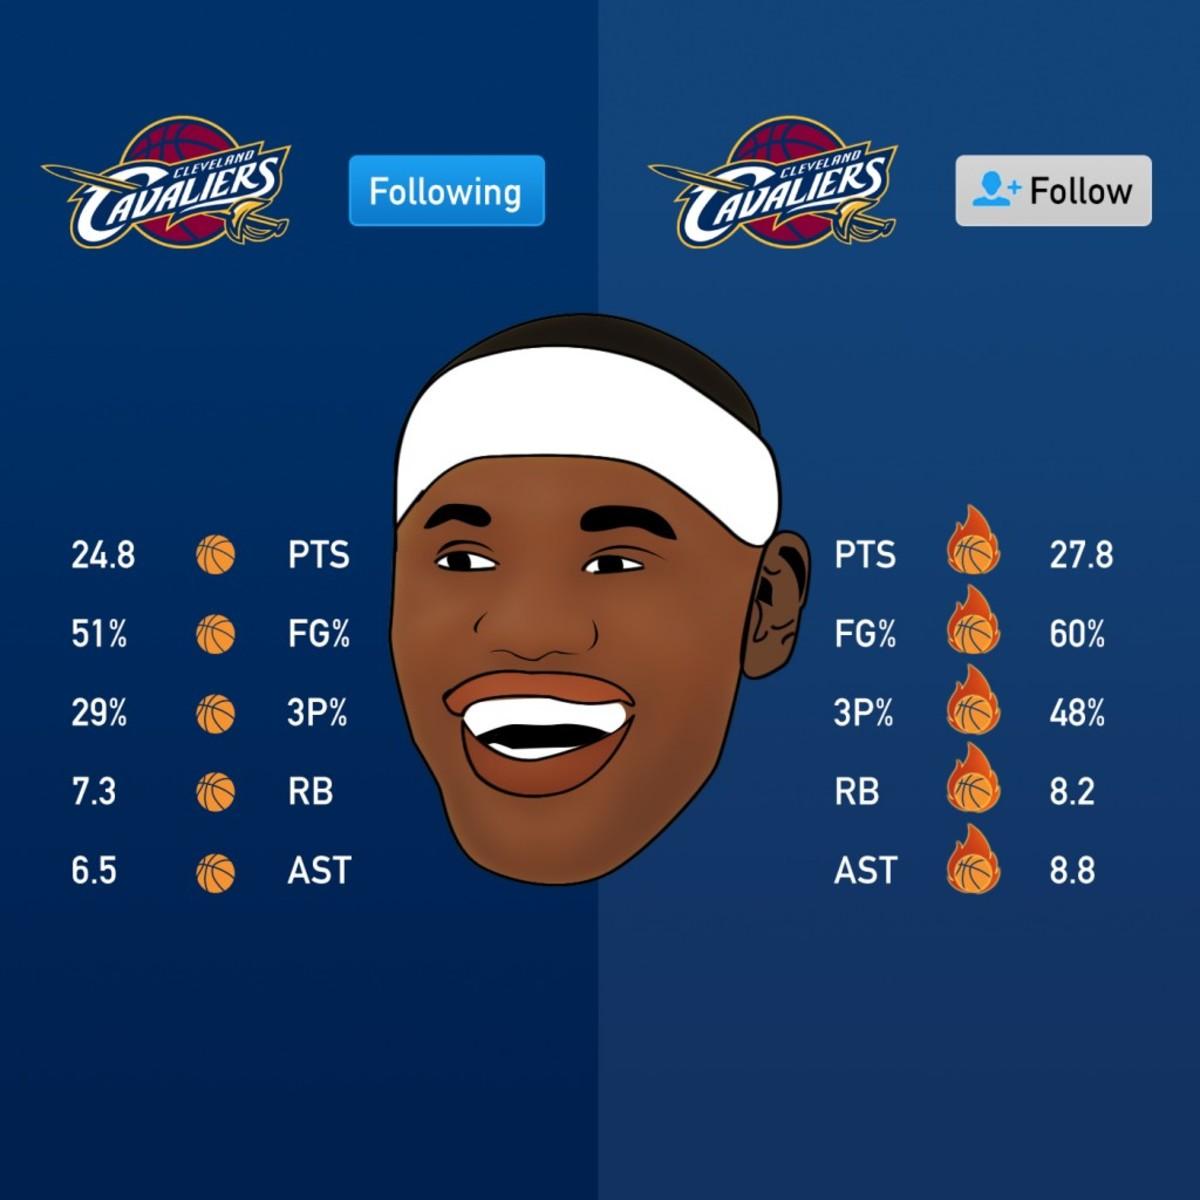 LeBron James unfollowed Cavs on Twitter